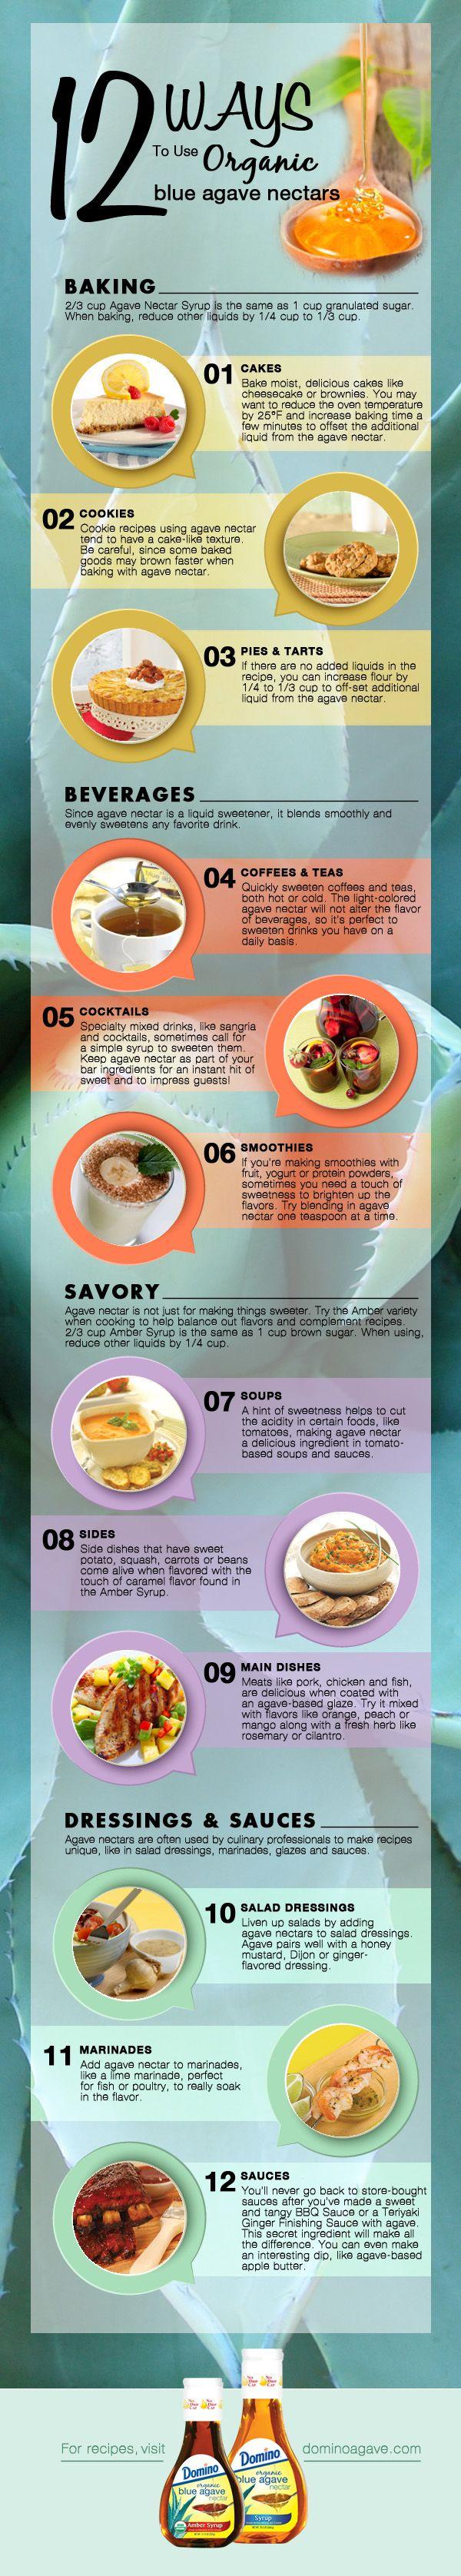 12 Ways to Use Organic Blue Agave Nectars #DominoAgaveGiveaway You ...